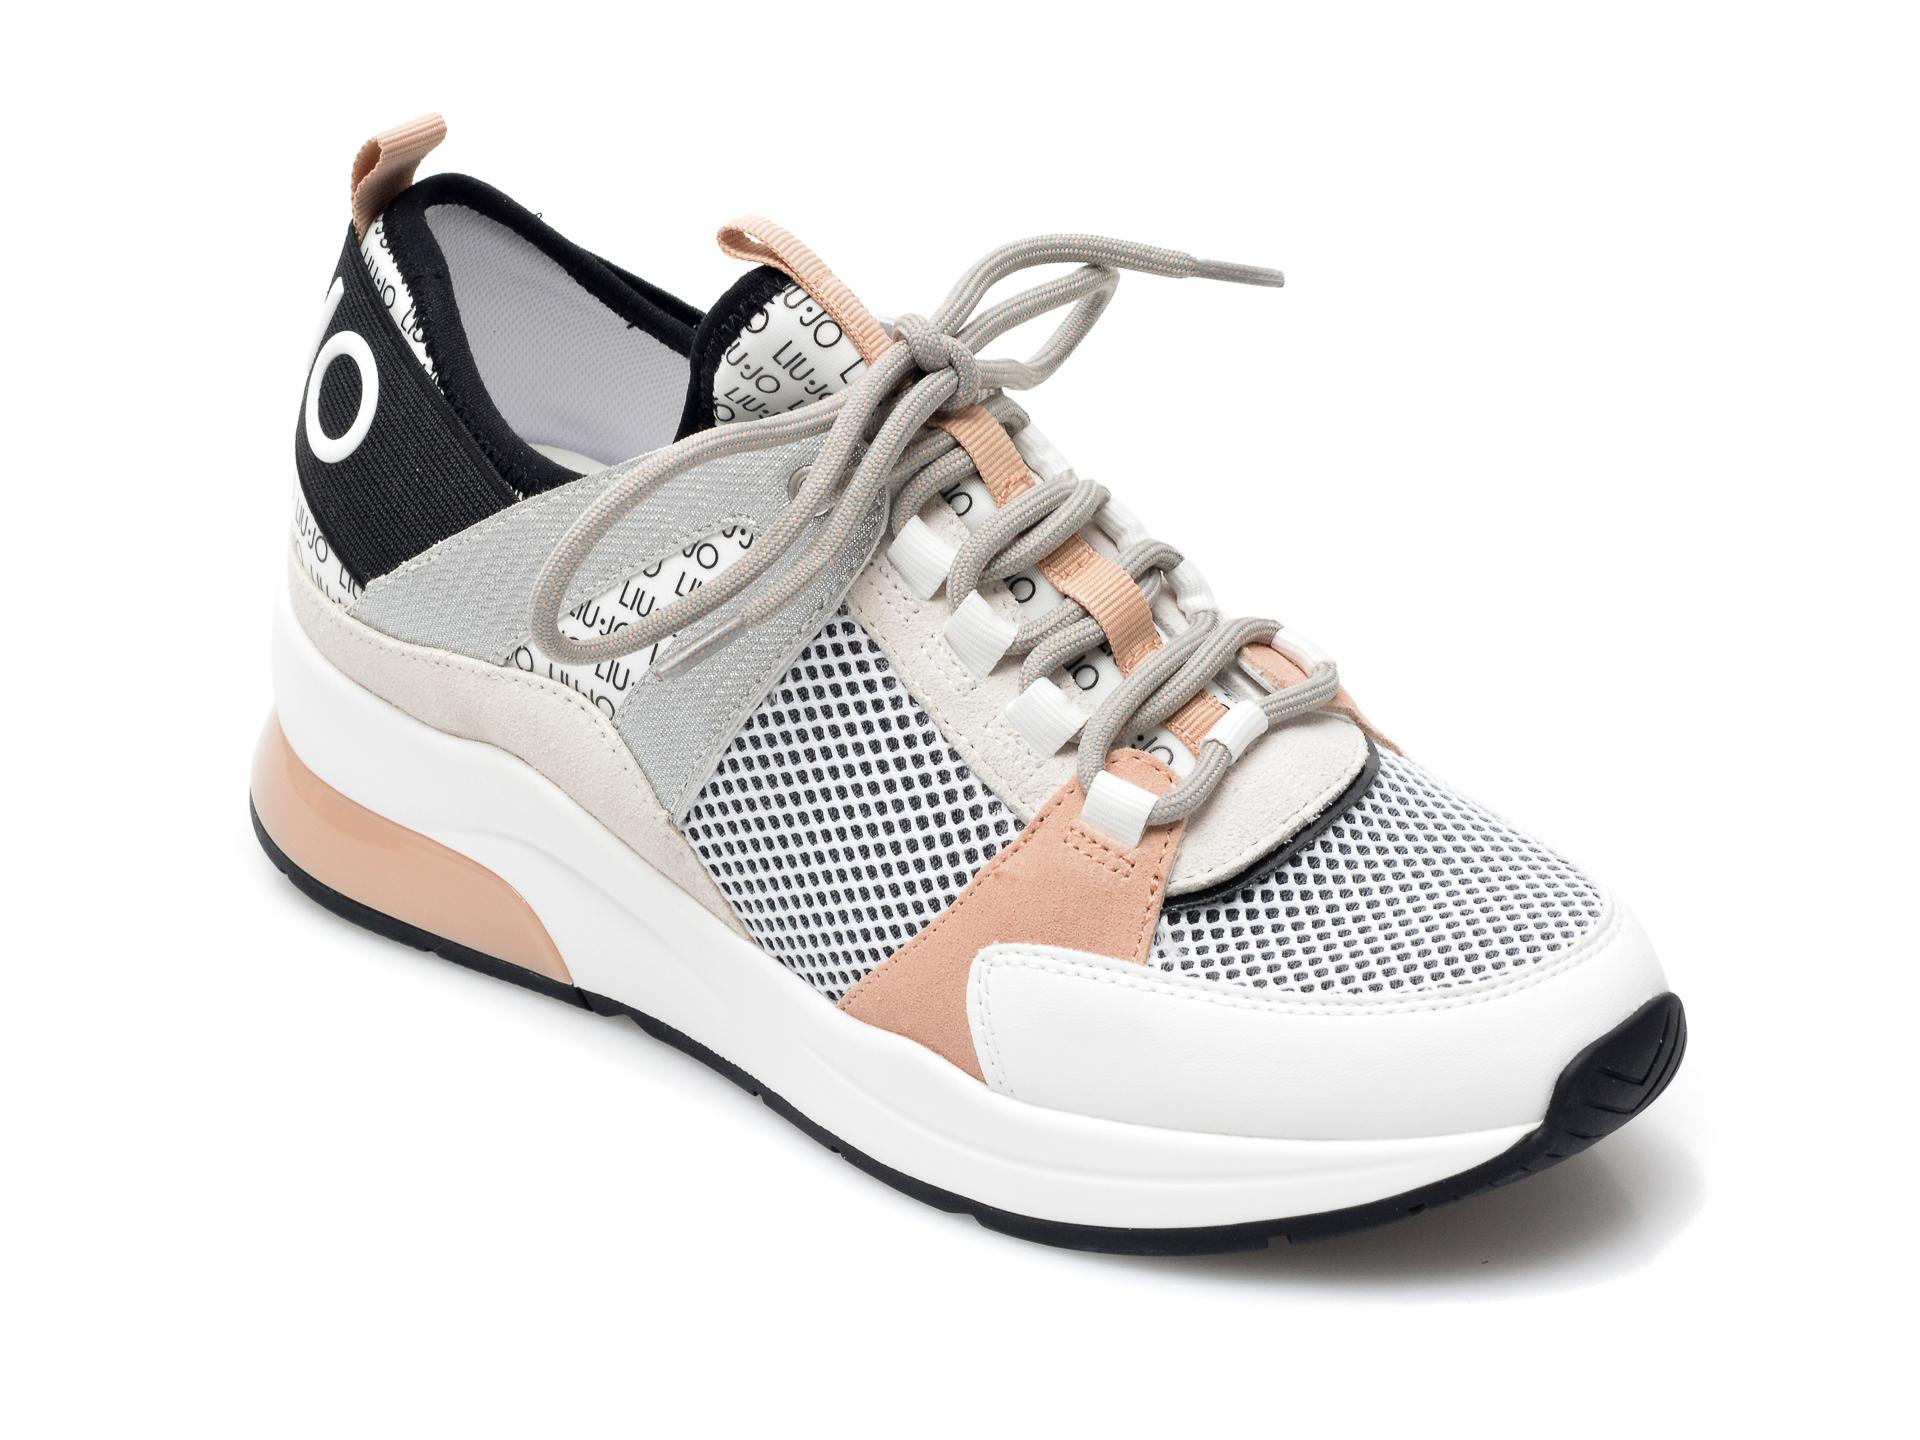 Pantofi sport LIU JO albi, Karlie 55, din material textil si piele ecologica